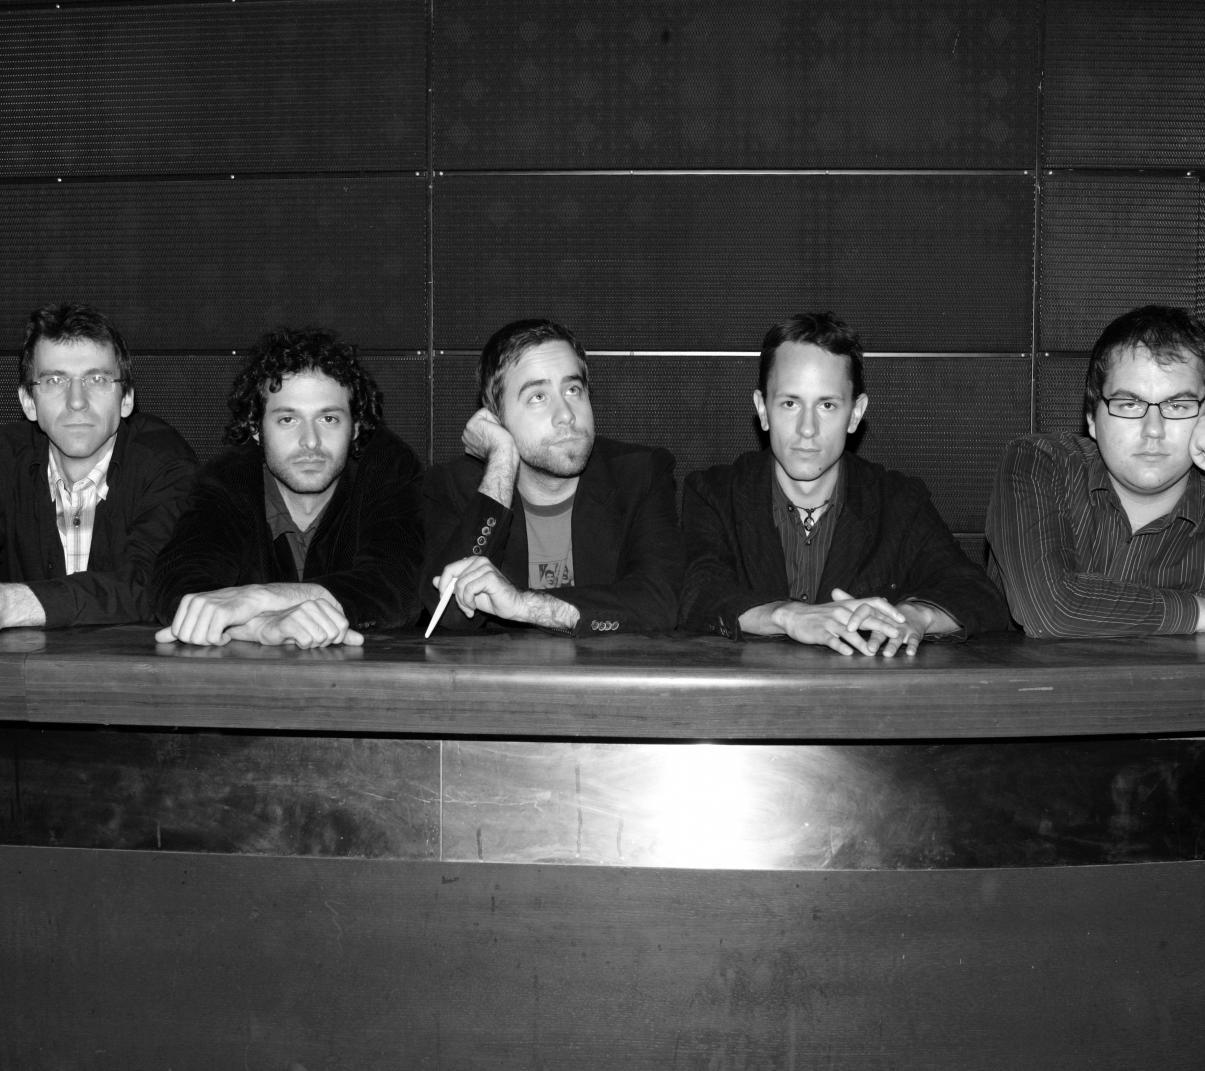 Petr Dvorský, Petr Kalfus, Viliam Béreš, Martin Novák, Miroslav Hloucal (foto Václav Jirásek)